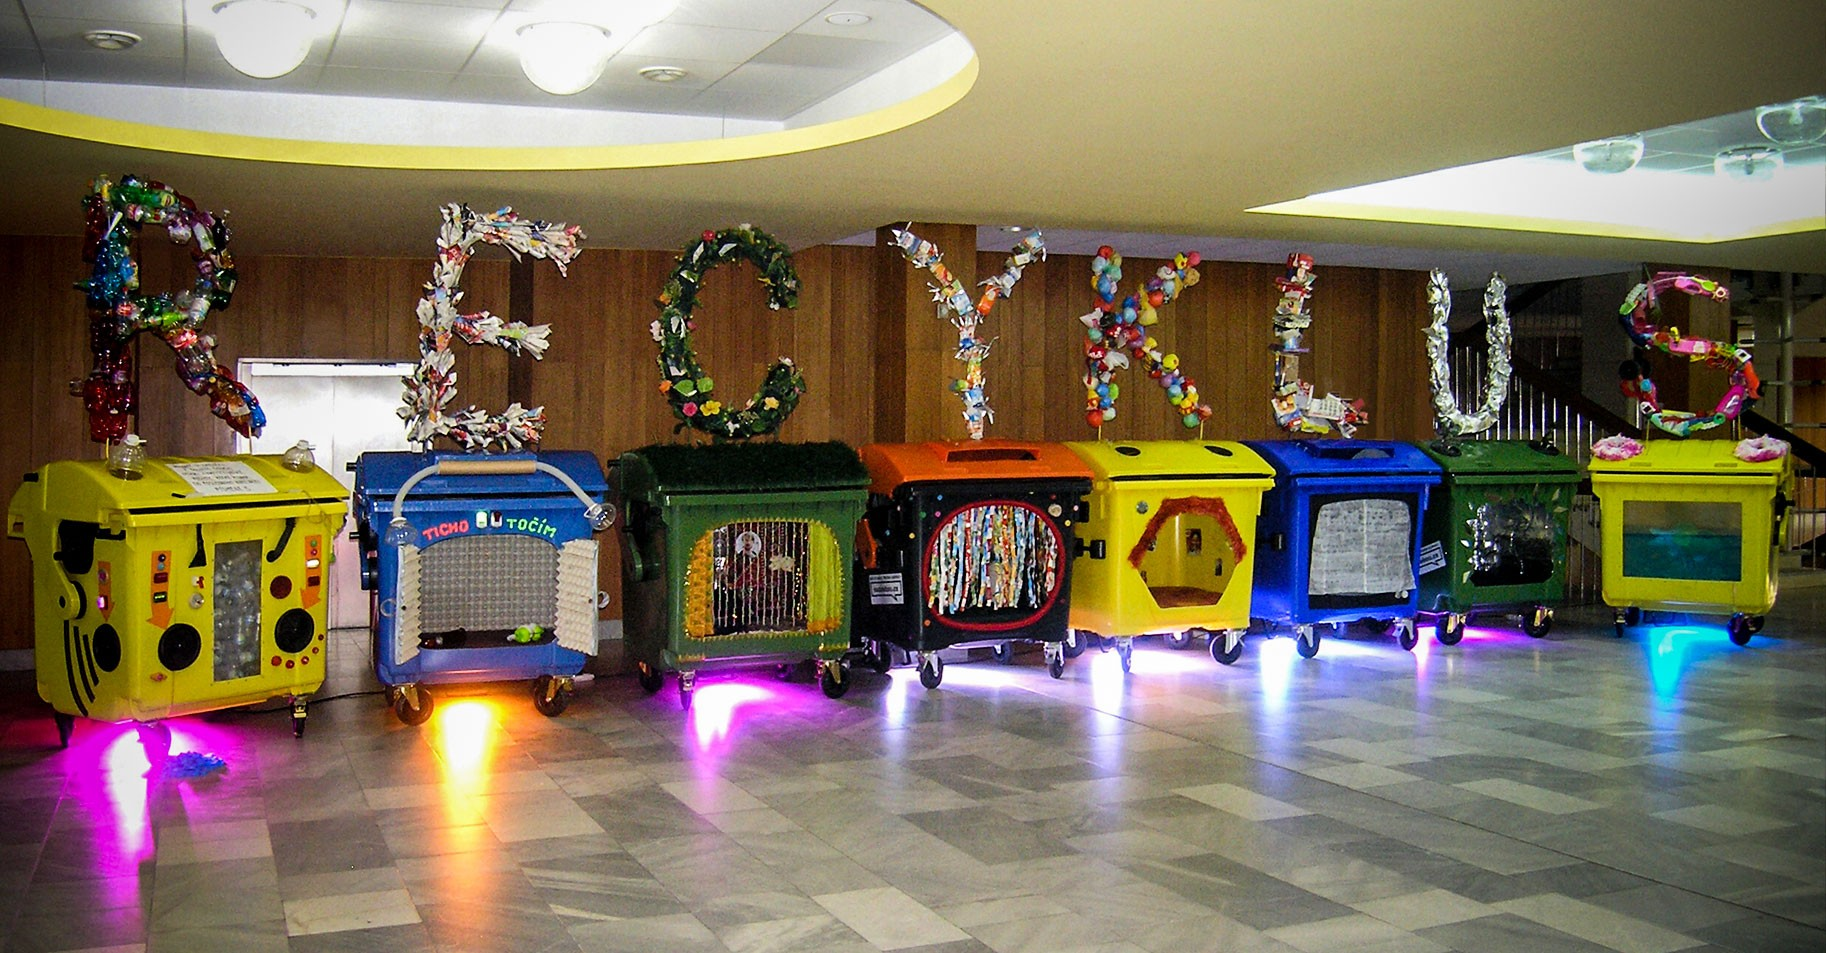 recyklus_kontejnery_trideni_odpadu_plast_papir_sklo_napojove_kartony